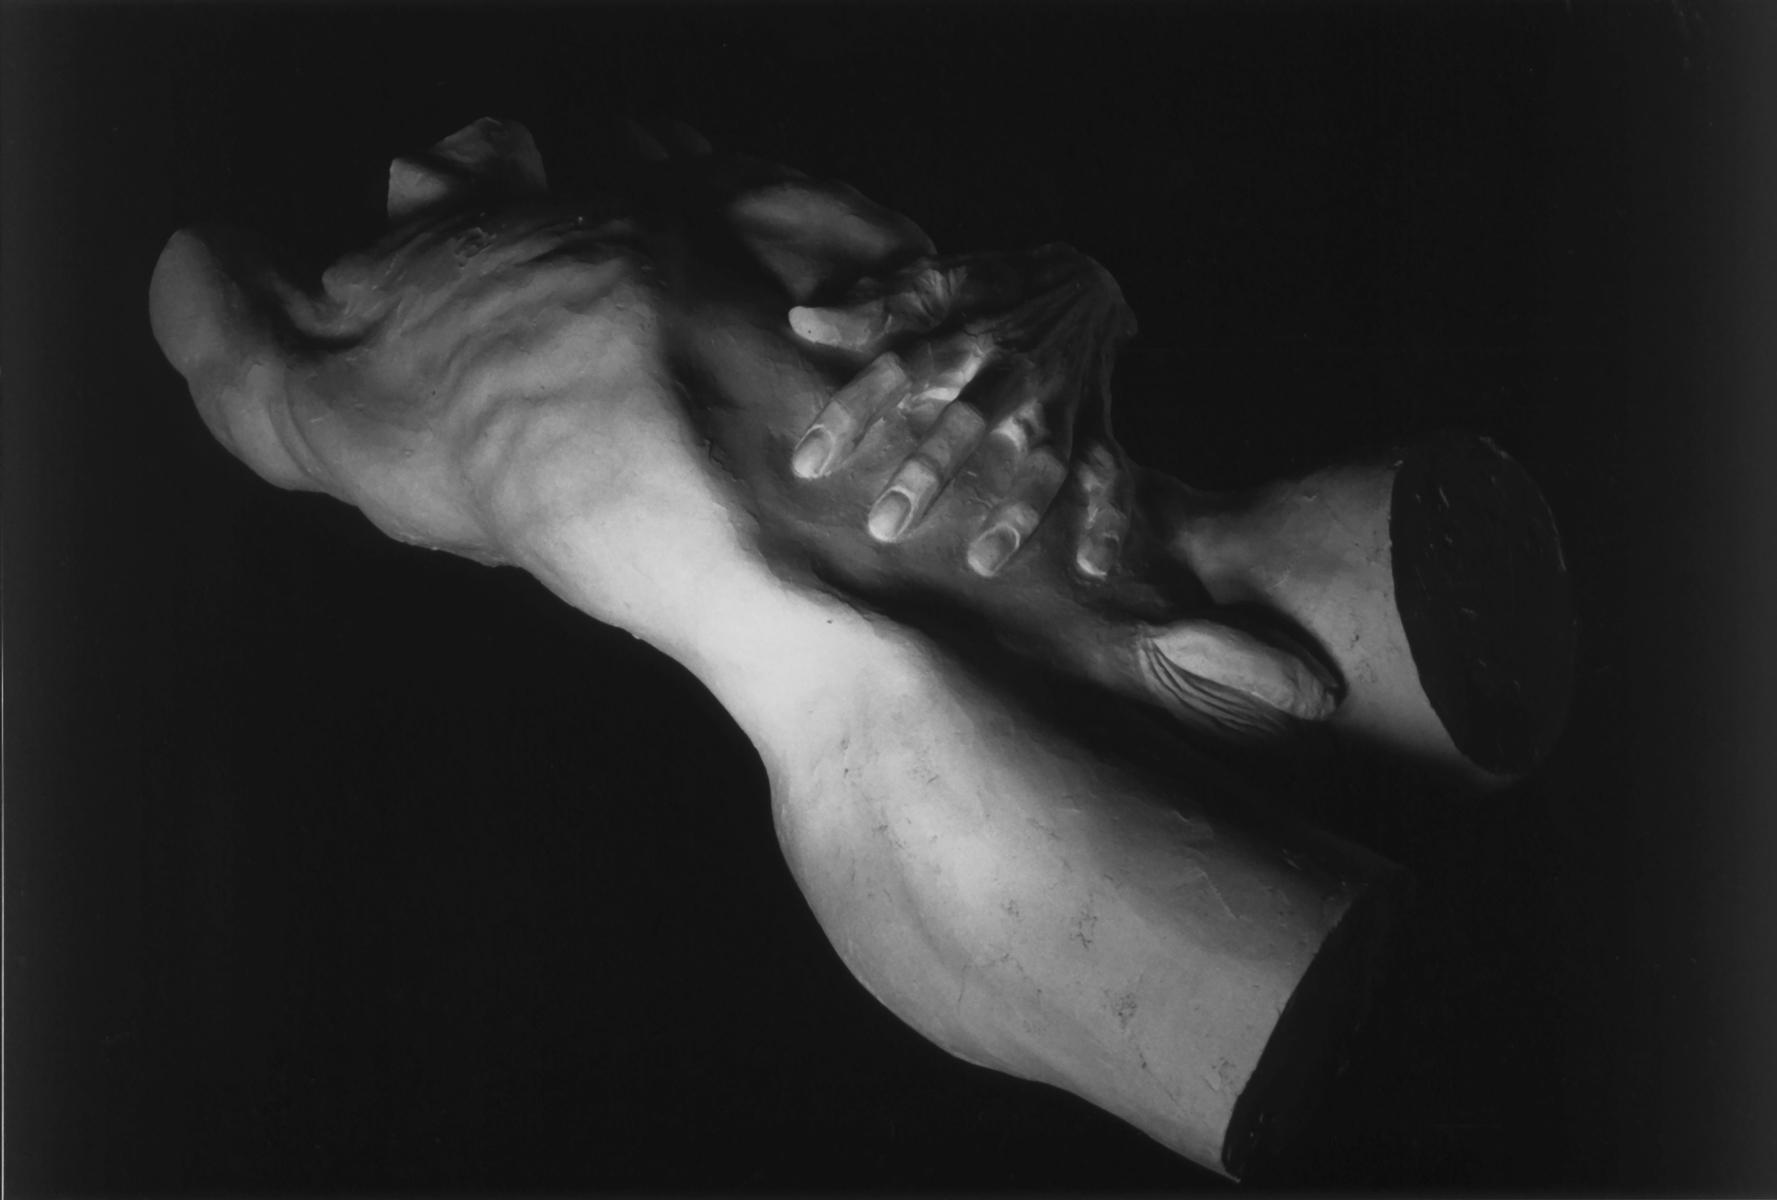 Elena-Mutinelli-18-etra-studio-tommasi